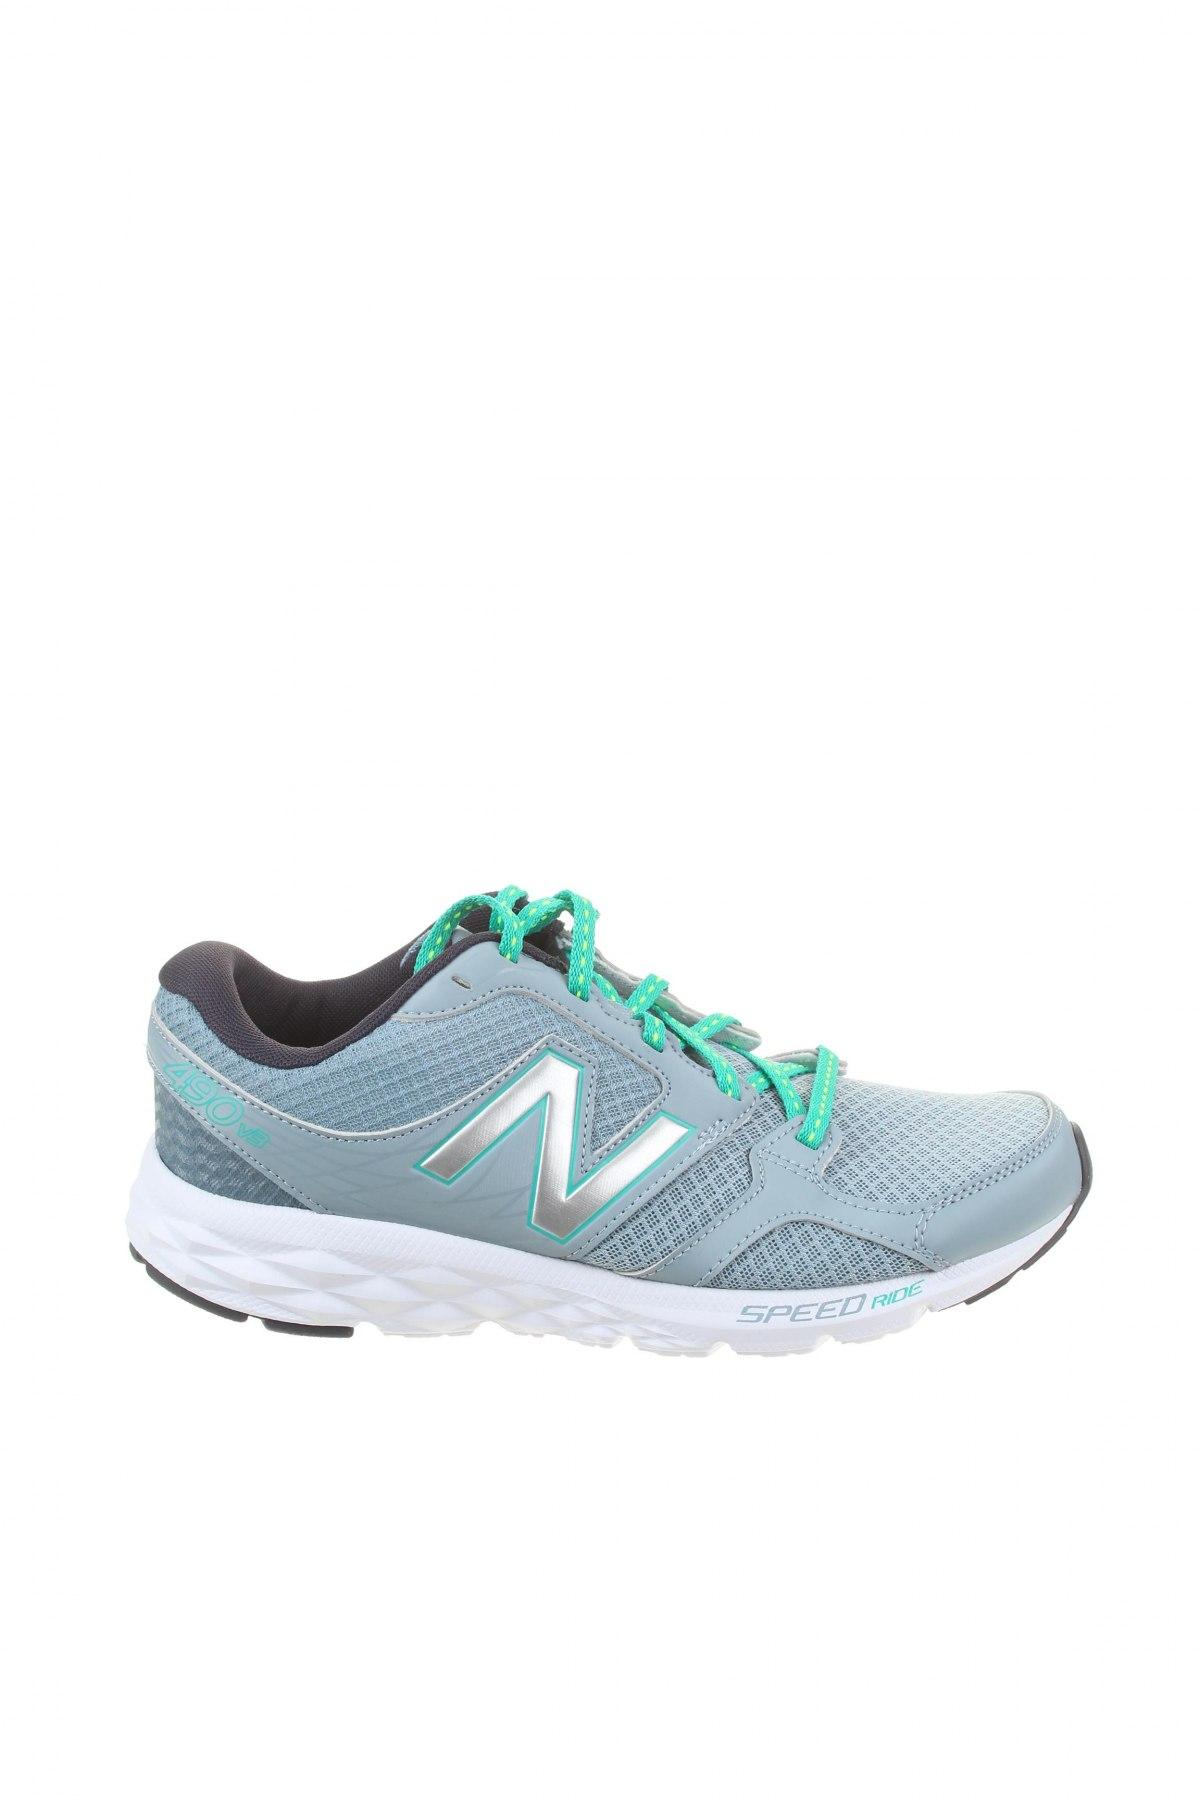 3a8a324d93 Γυναικεία παπούτσια